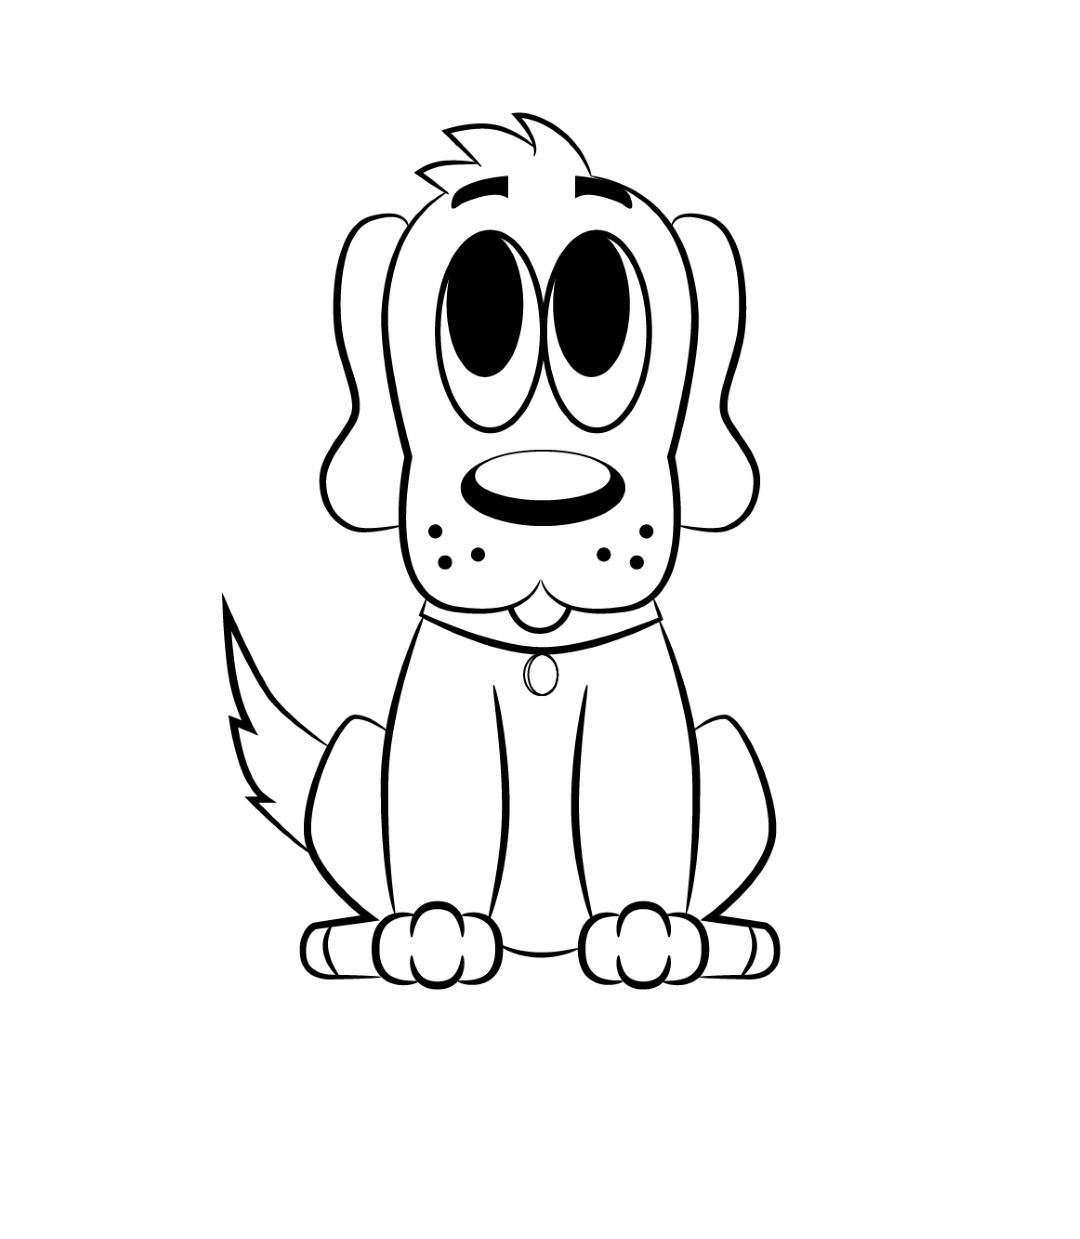 1080x1239 Cartoon Drawings Of Dogs